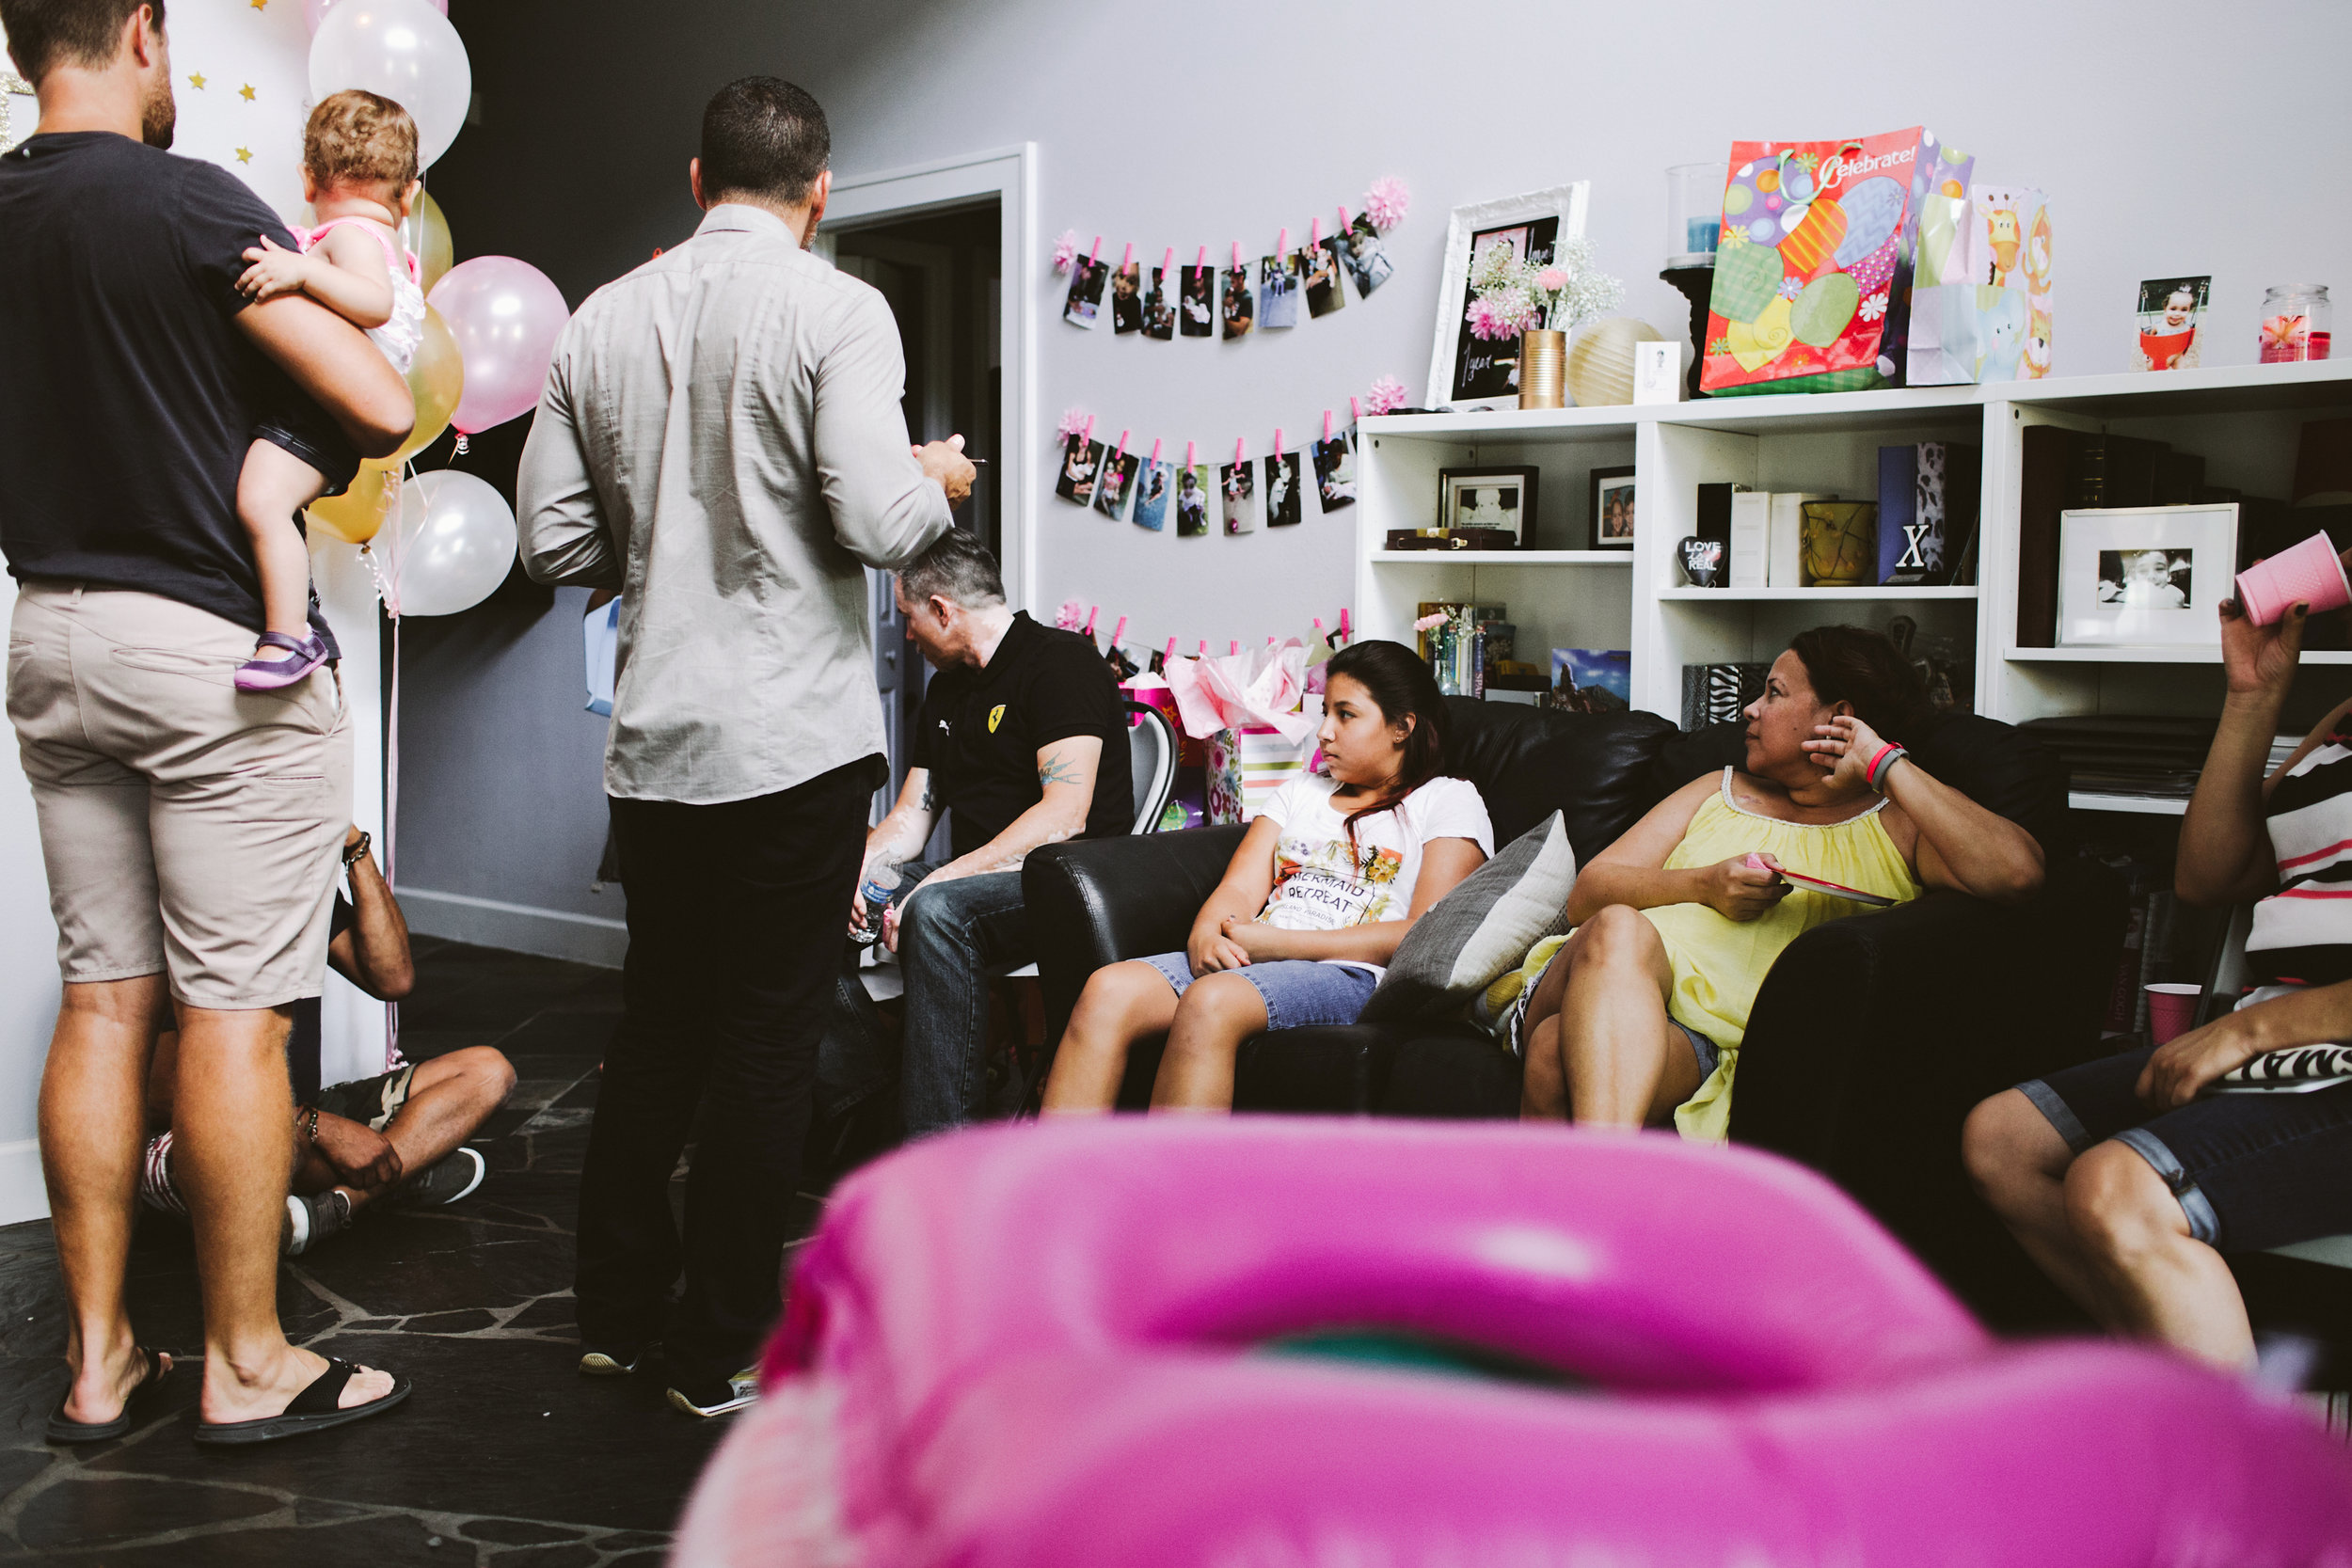 First Birthday | Vanessa Boy Photography | vanessaboy.com |-58.com |final.jpg